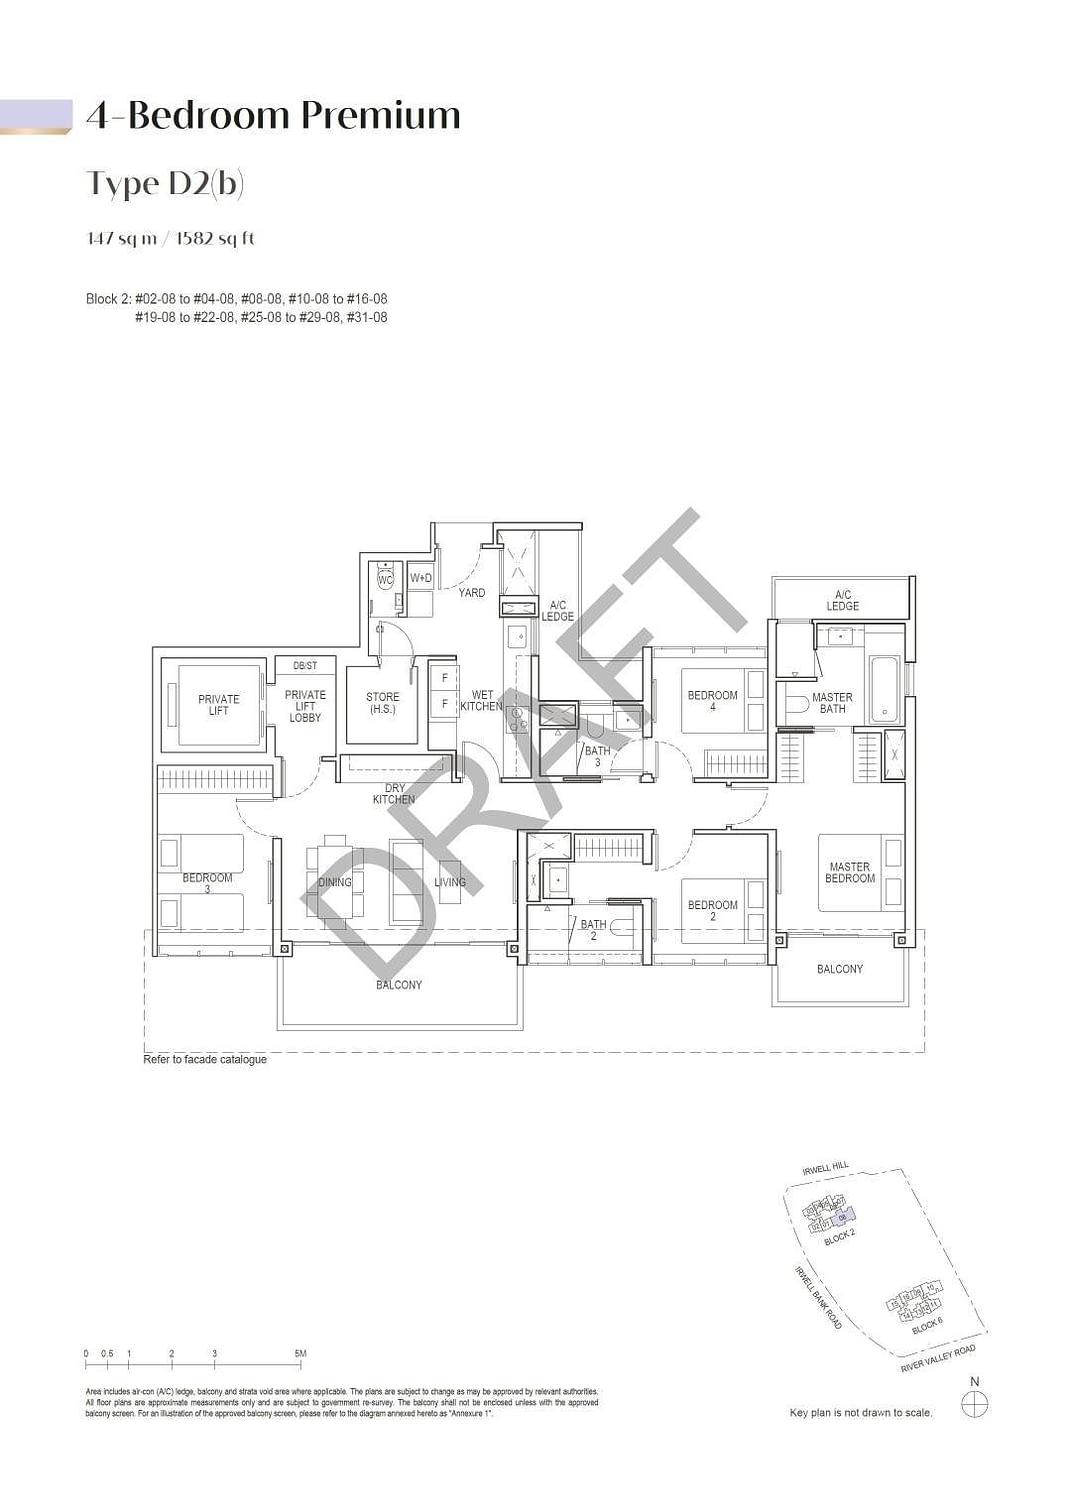 Irwell Hill Residences Irwell Hill Residences floorplan type D2b